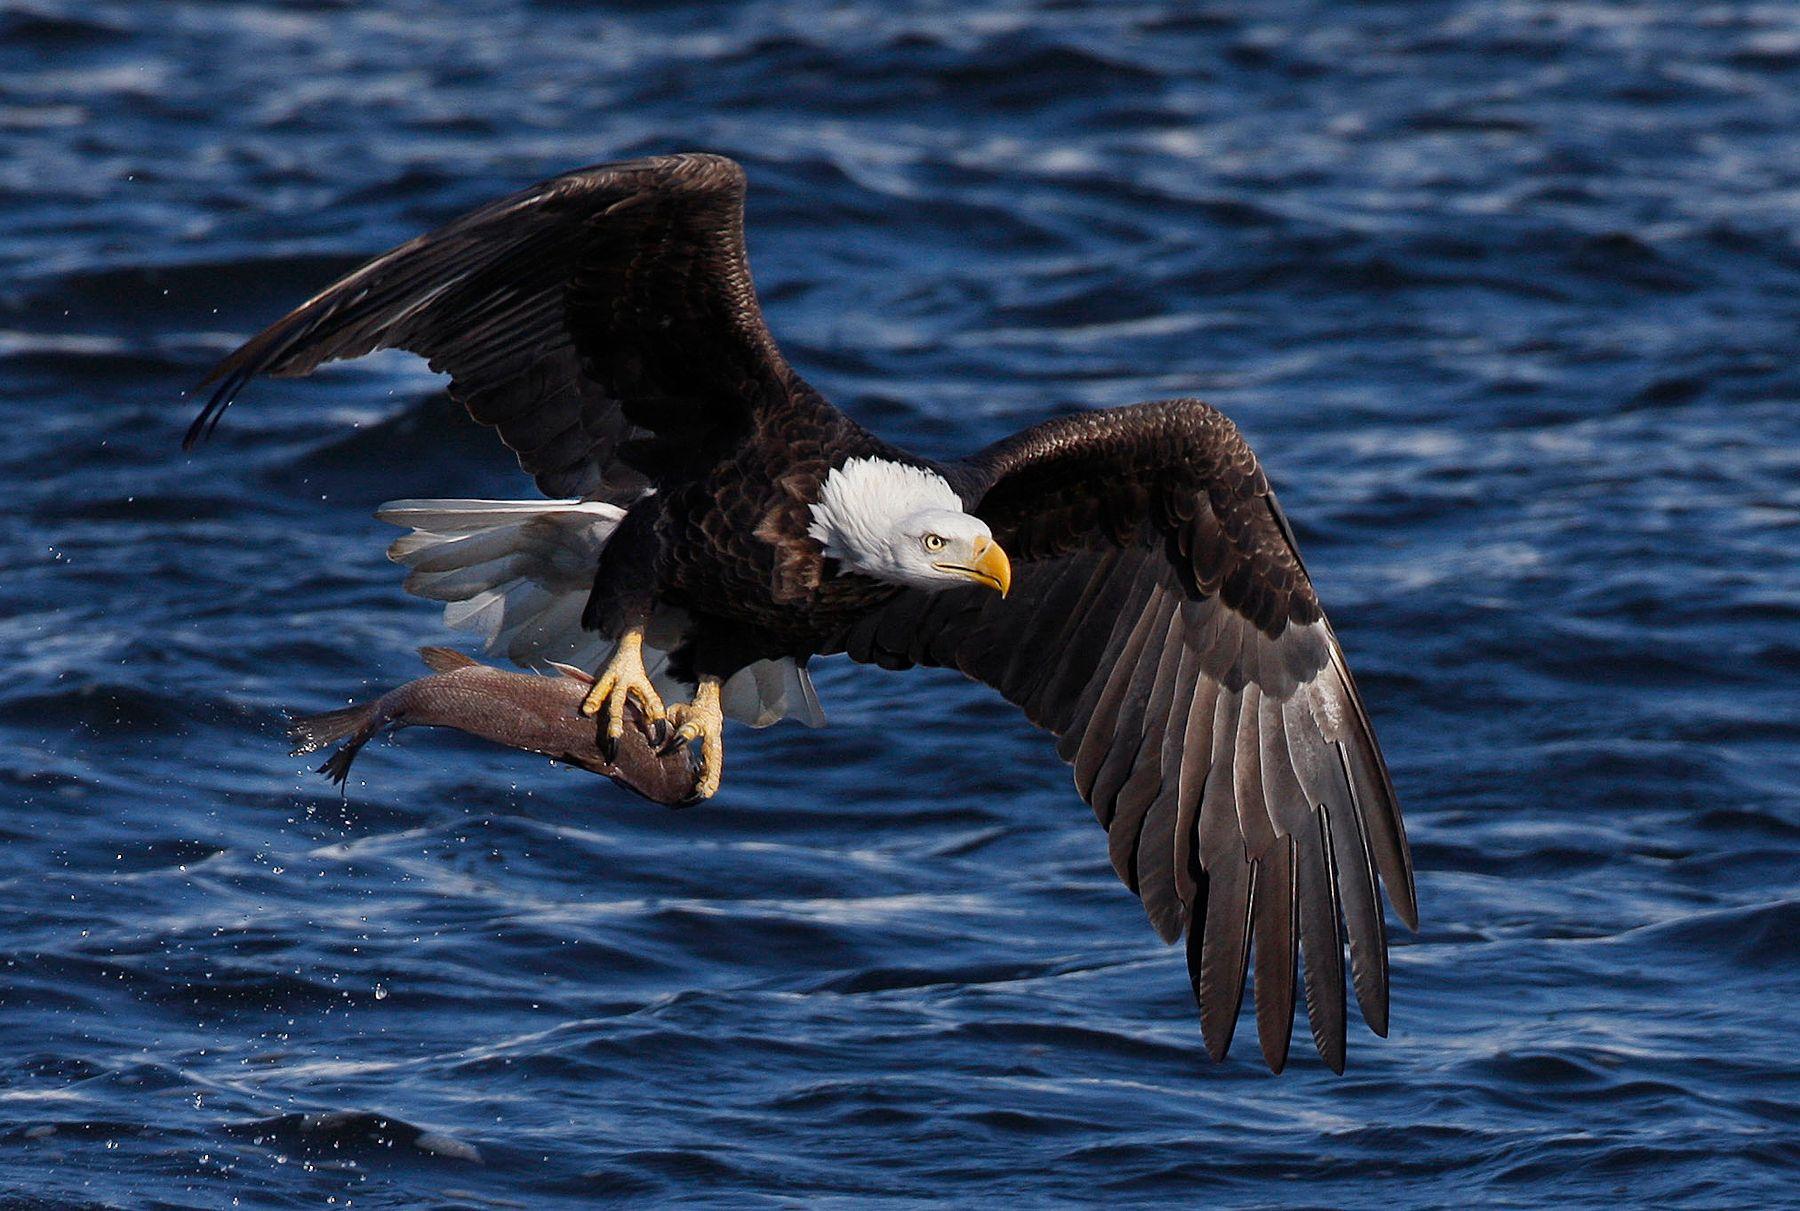 Bald Eagle with perch. Mississippi River. Iowa.